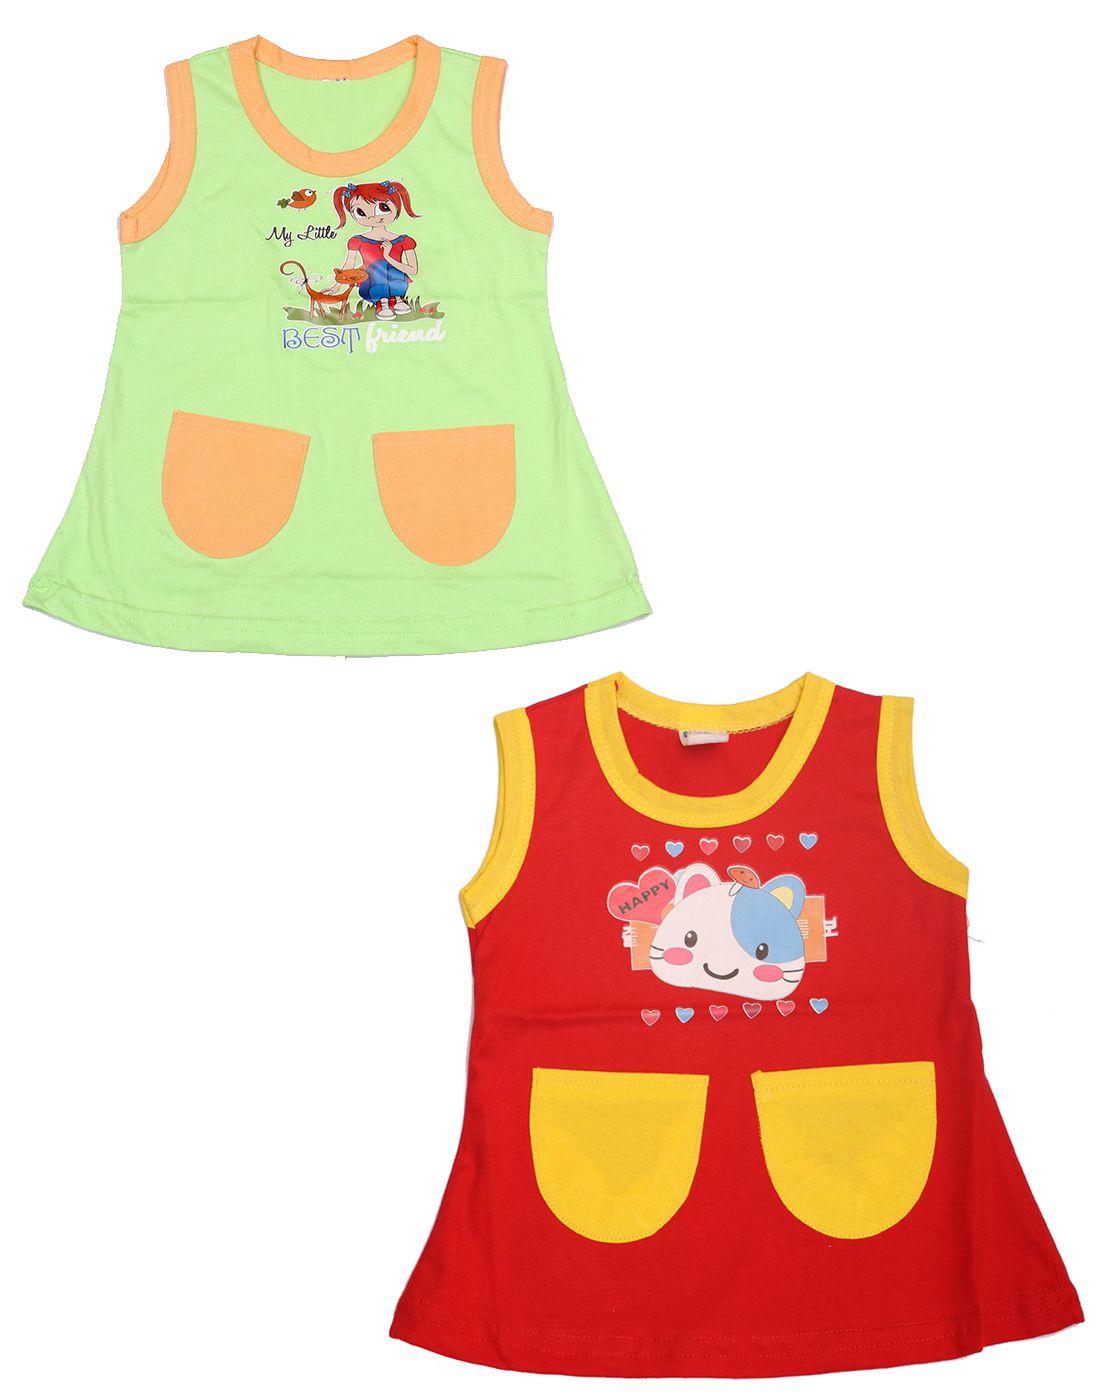 bb3233abab Babeezworld Regular Wear Summer Baby Girl Cotton Half Sleeves Cut Sleeve  Sleeveless Vest Jhabla A line Frock Dress (Kids Pack Of 2) - Buy  Babeezworld ...